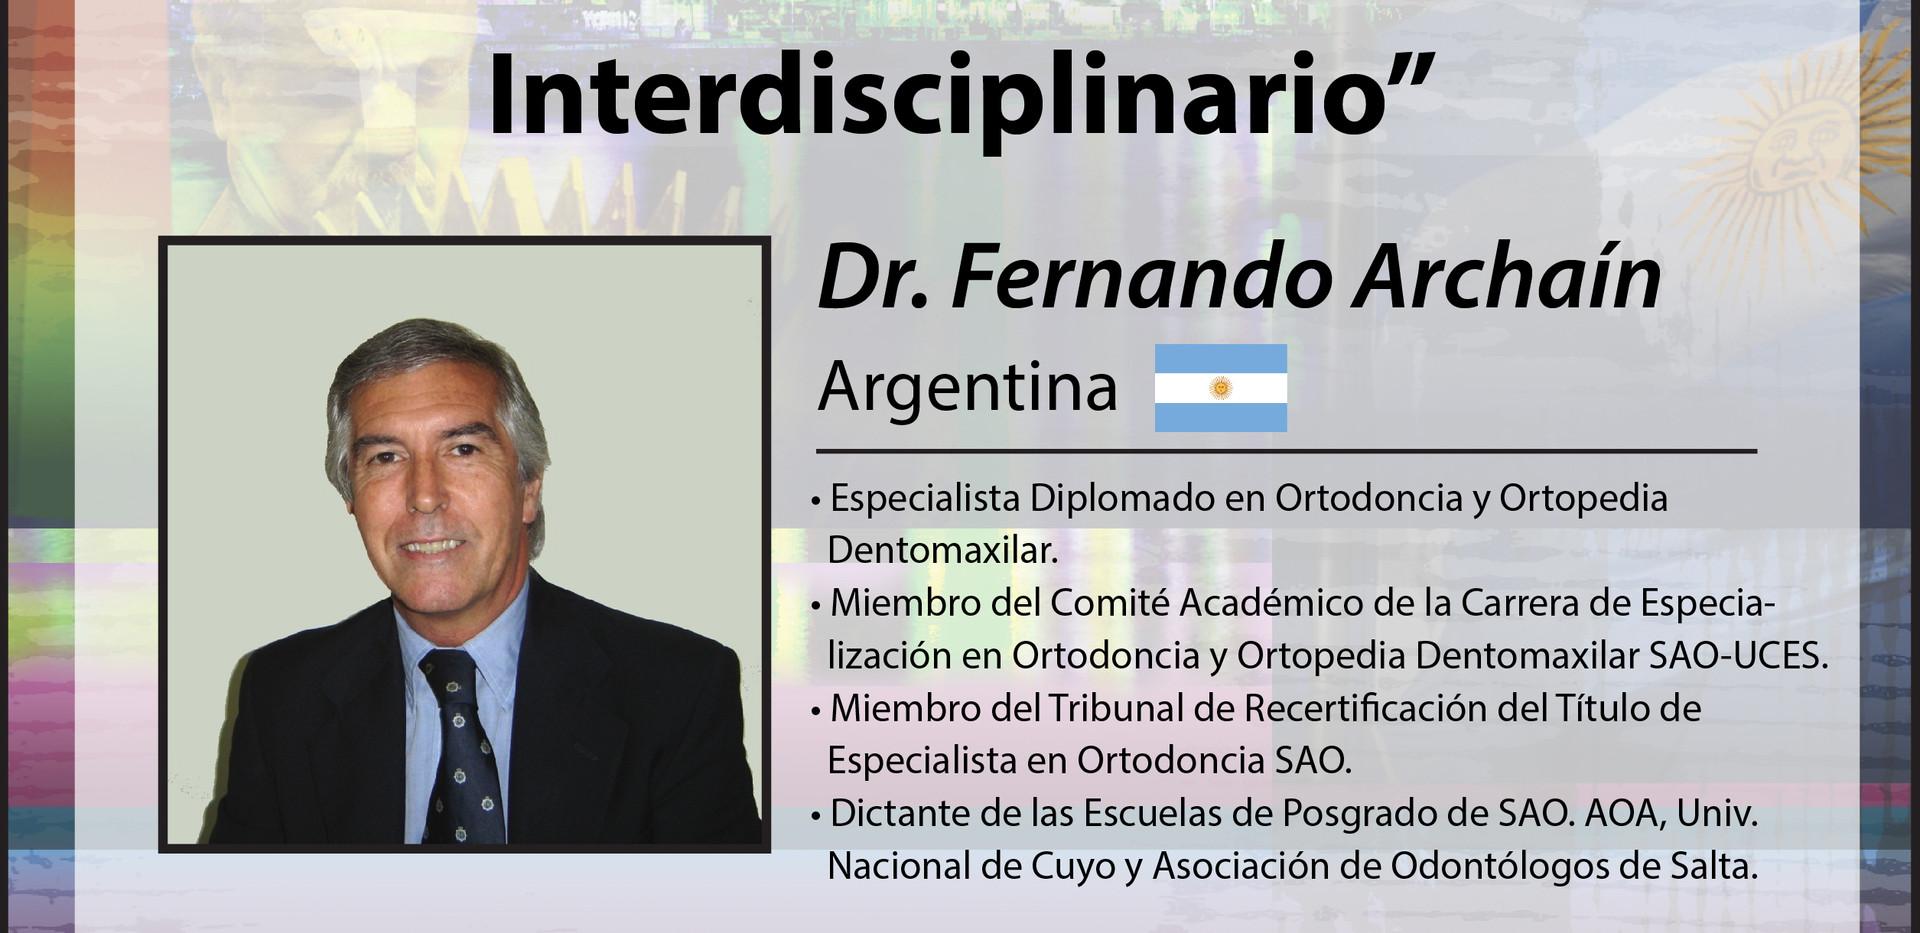 Dr. Fernando Archaín